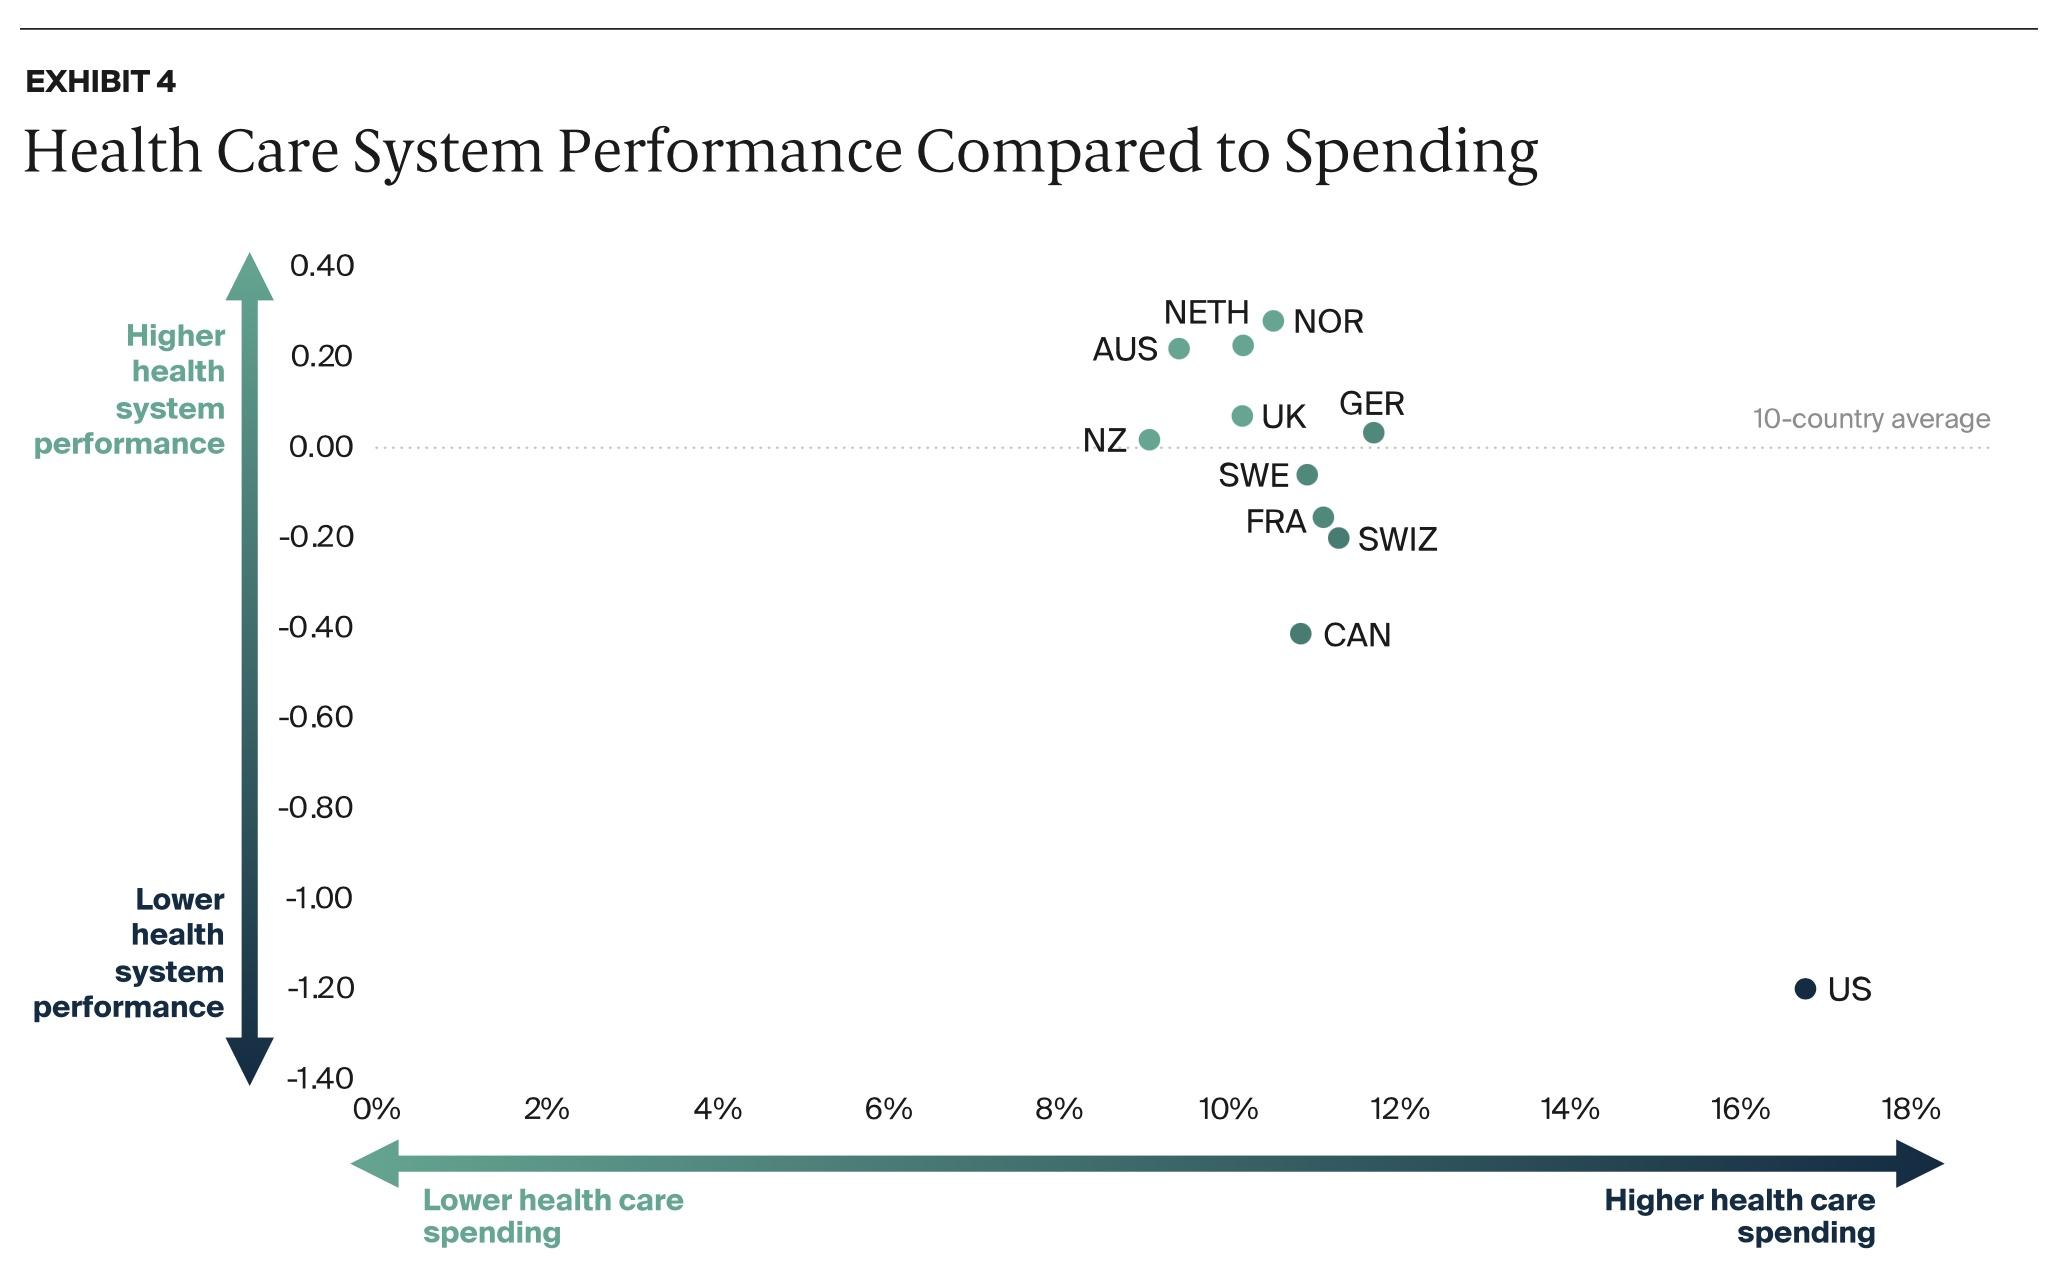 Health care spending vs. quality